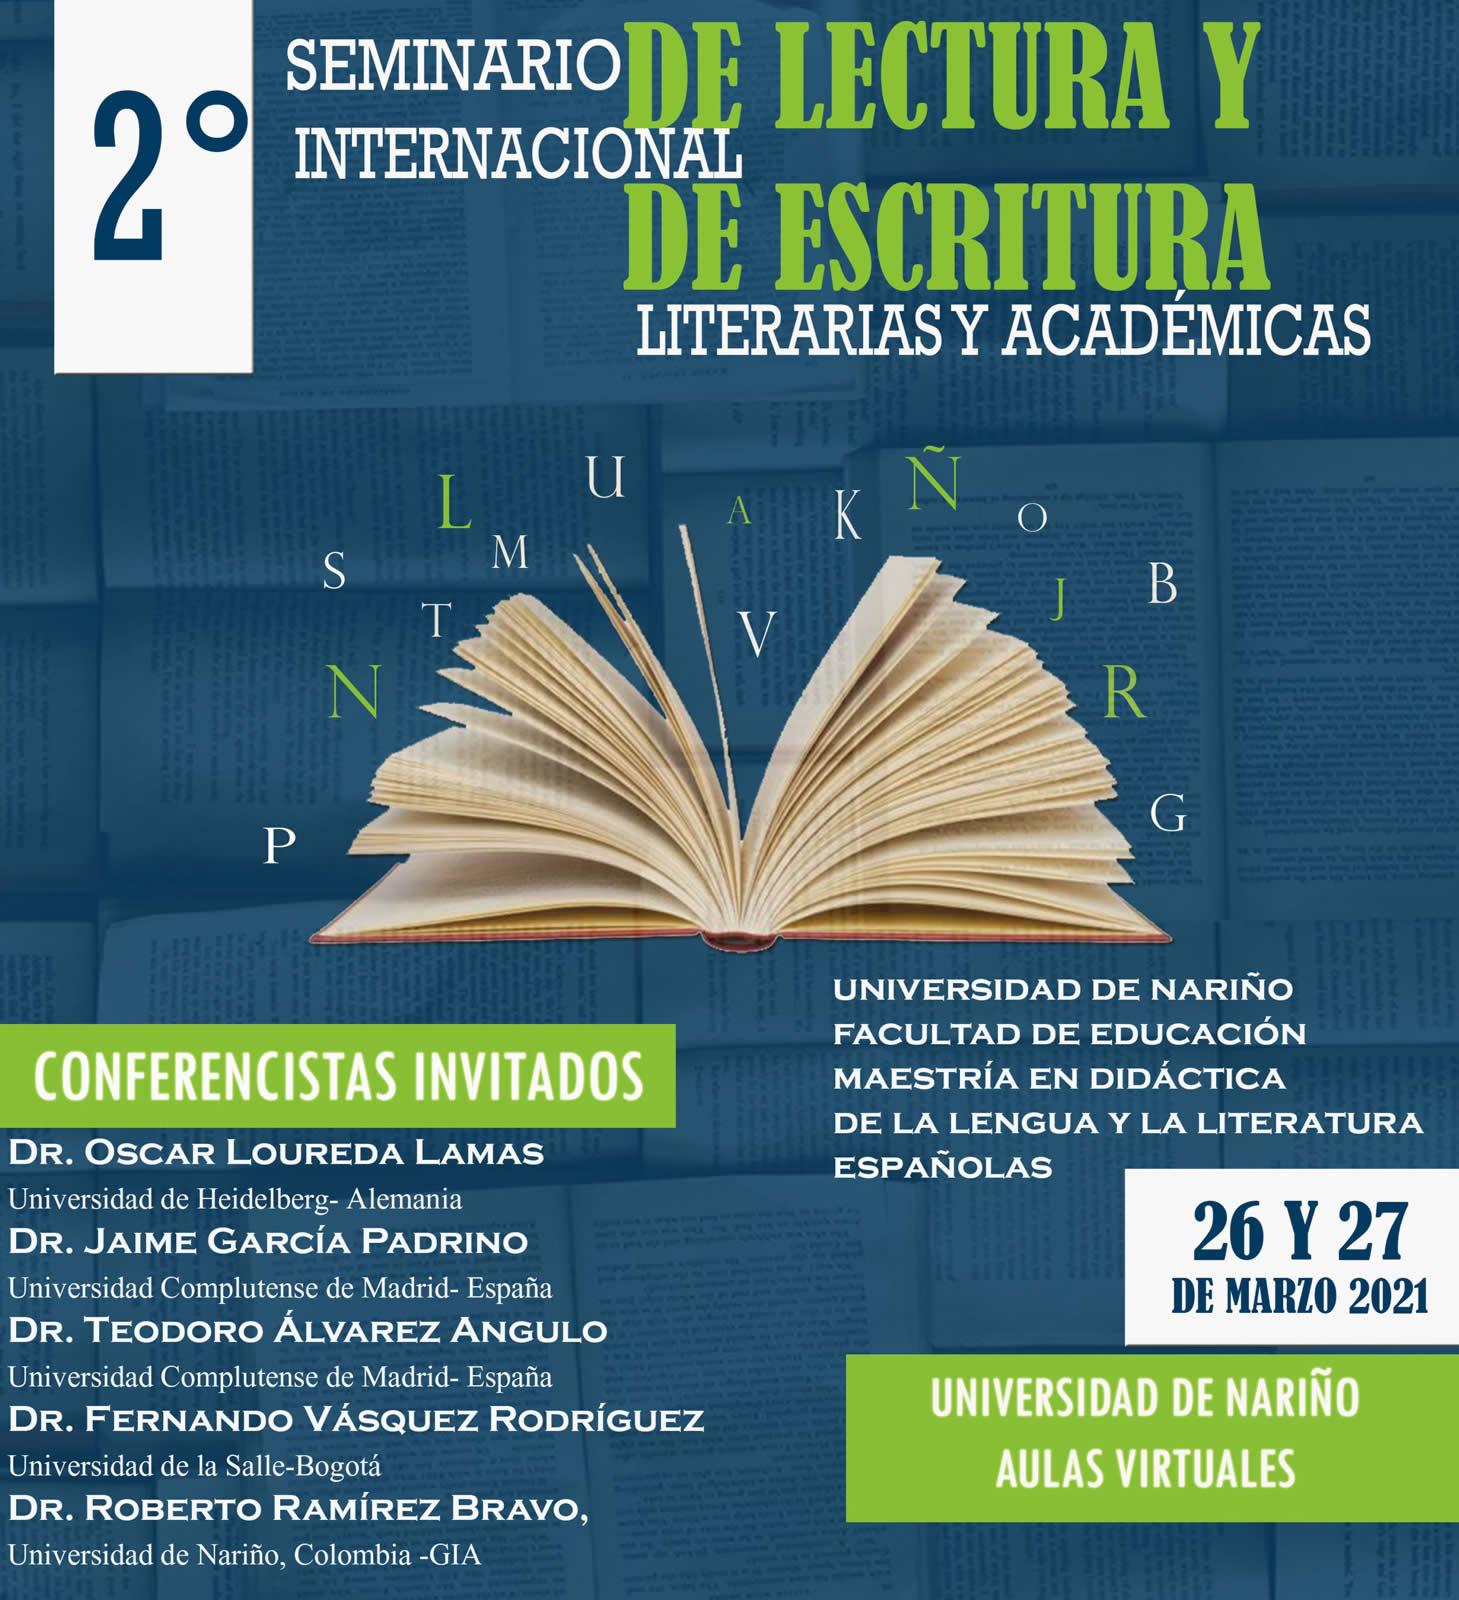 afiche 2 seminario internacional lectura escritura 2021